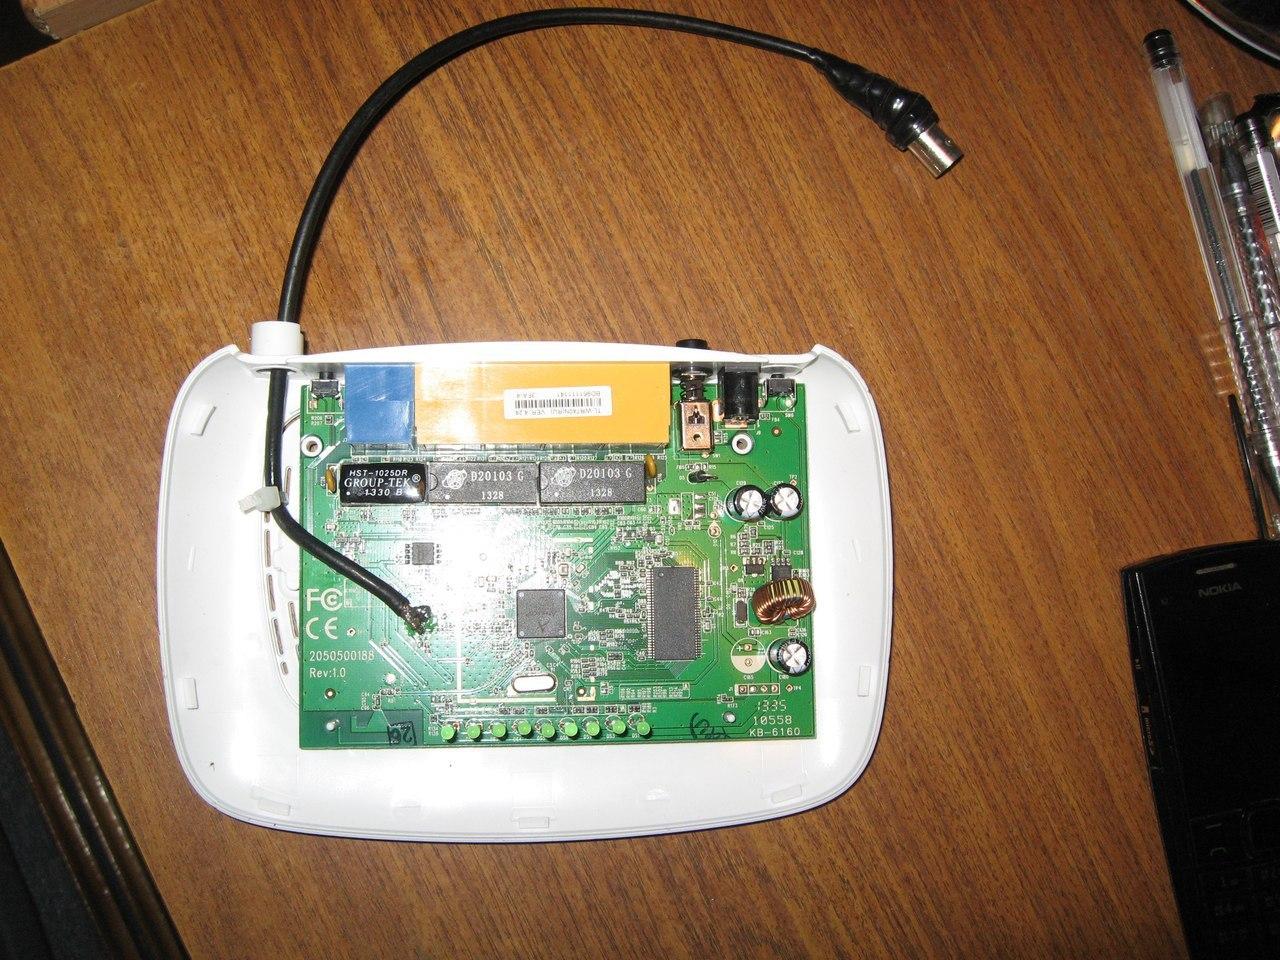 Антенна для Wi Fi на коленке за 10 минут